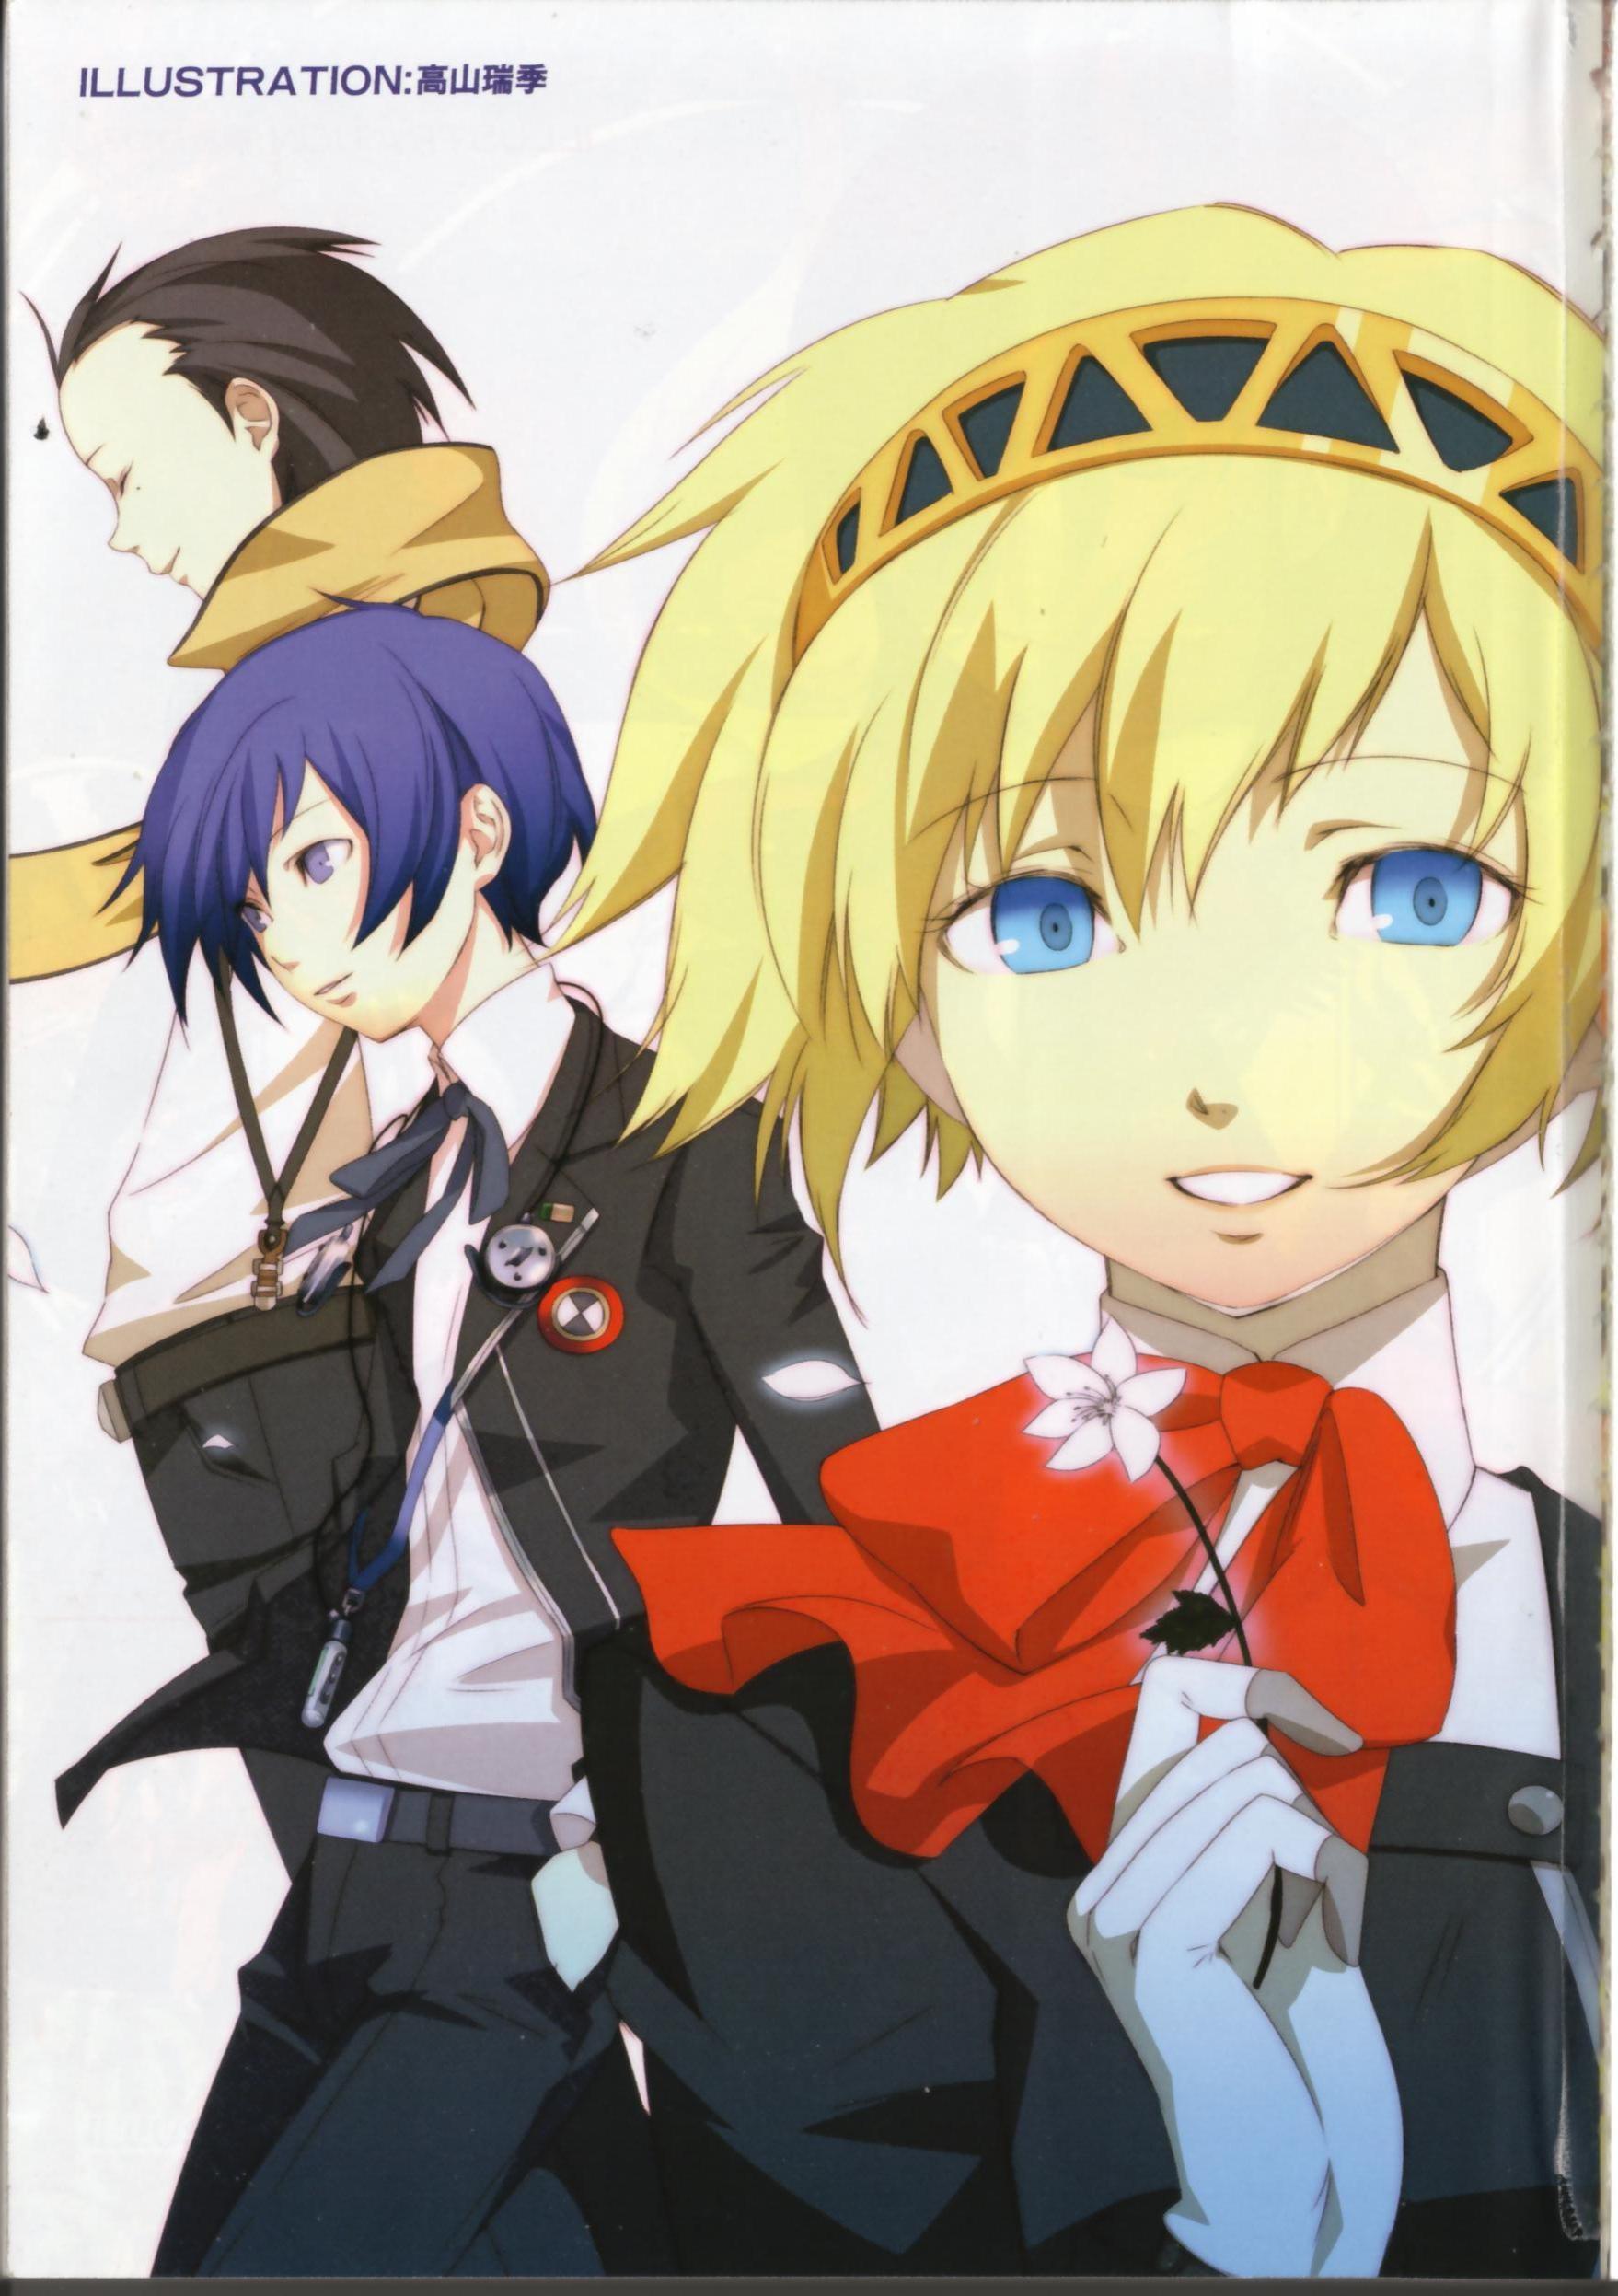 Tags: Anime, Shin Megami Tensei: PERSONA 3, Mobile Wallpaper